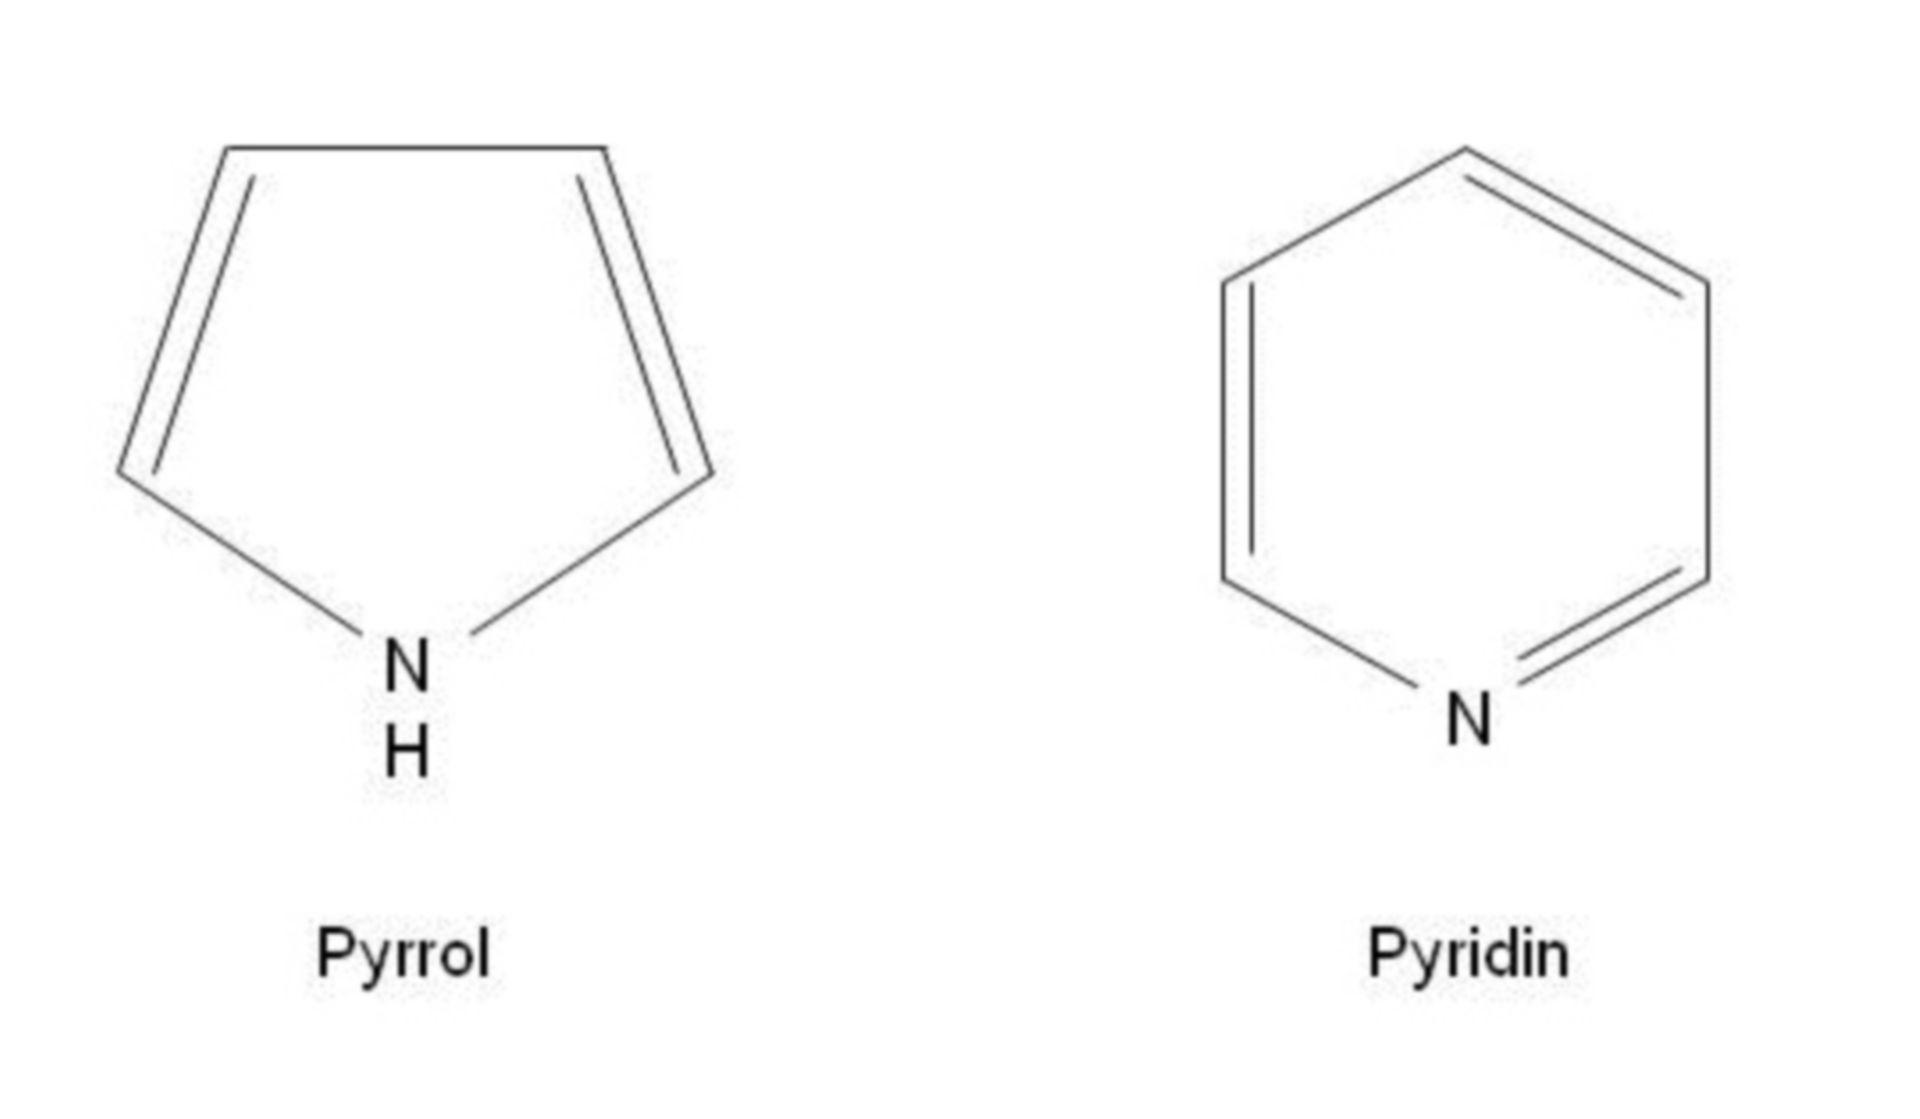 Pyrrole and Pyridine